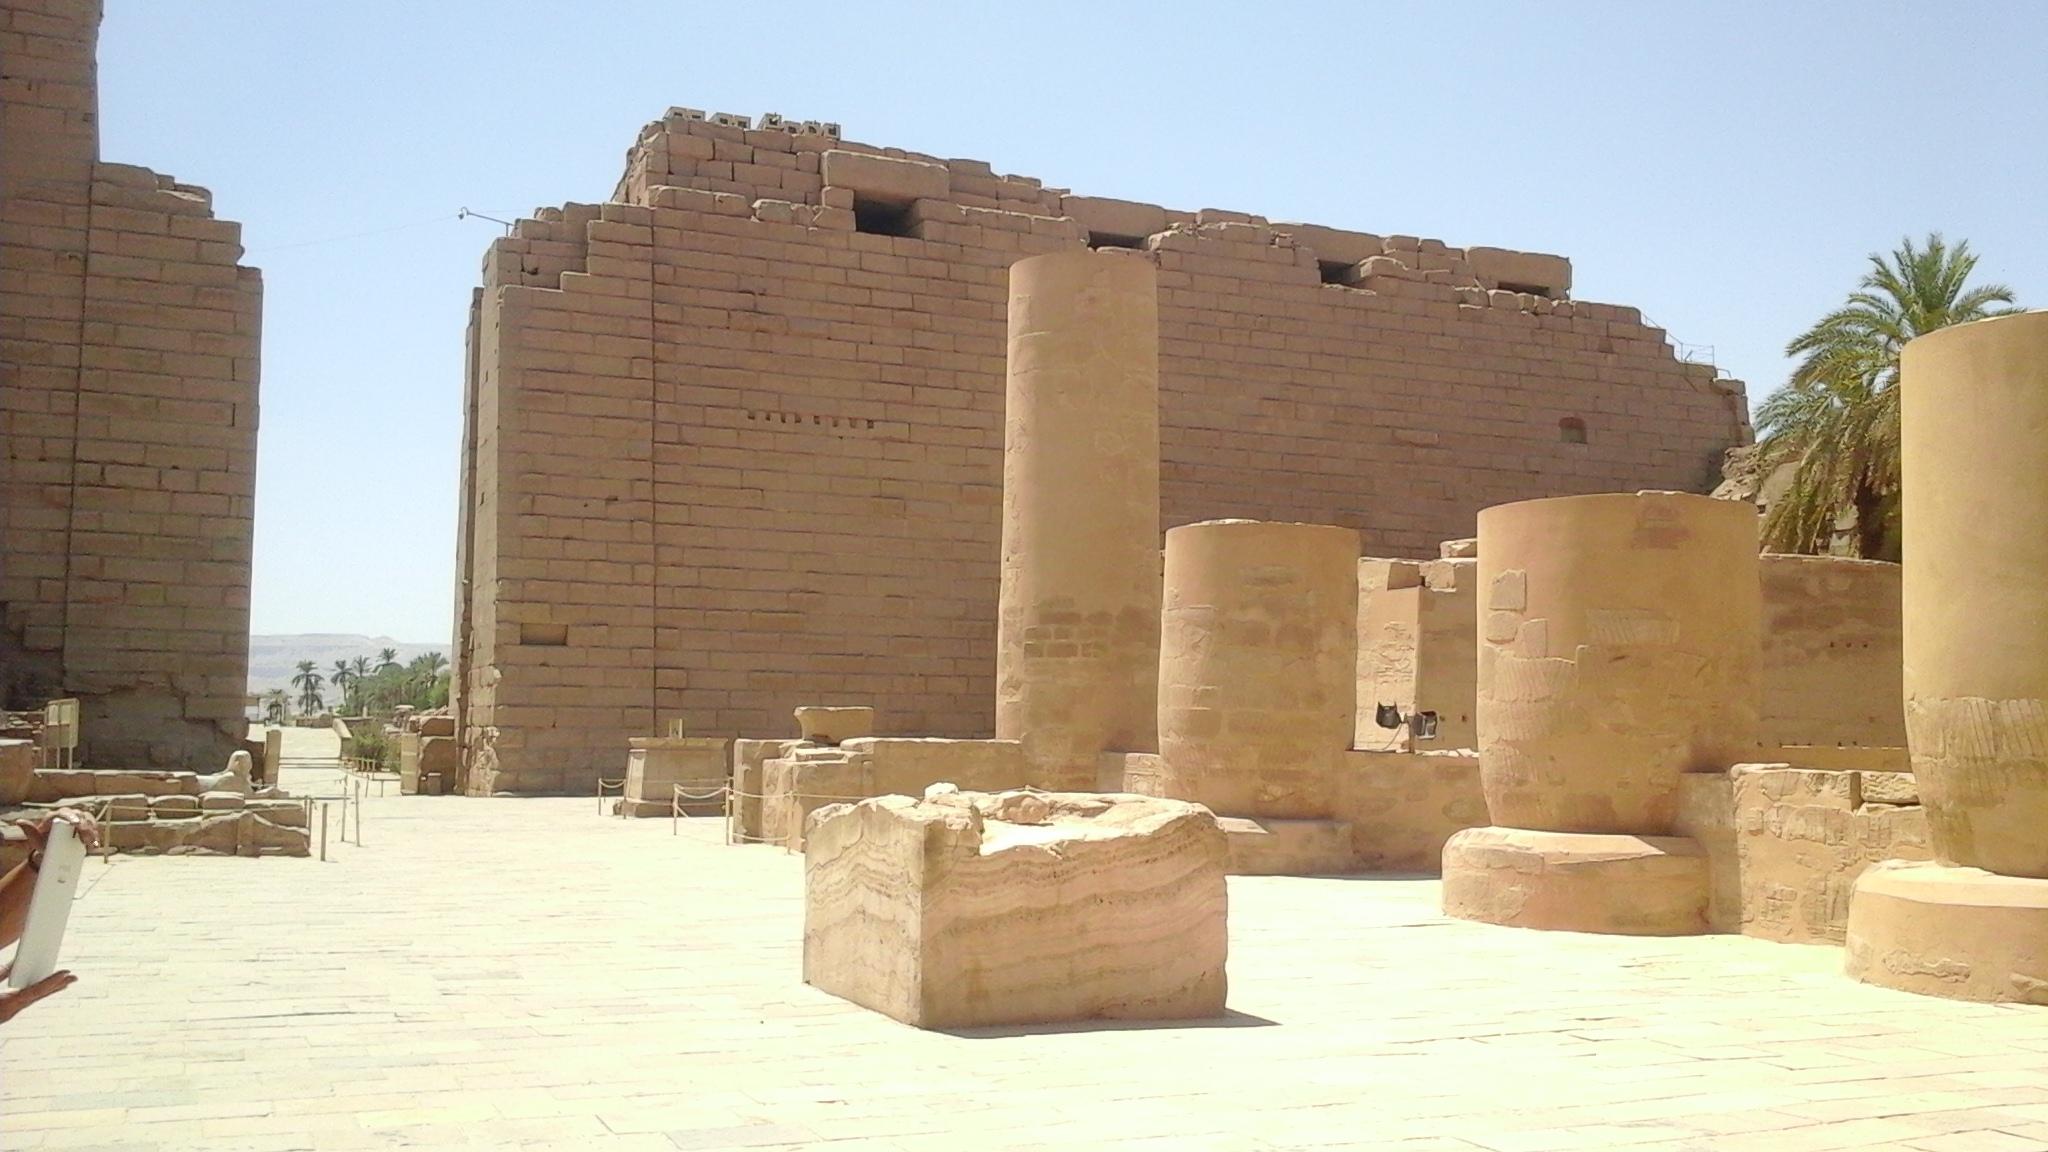 The Kiosk of Tahraqa in the temple of Karnak